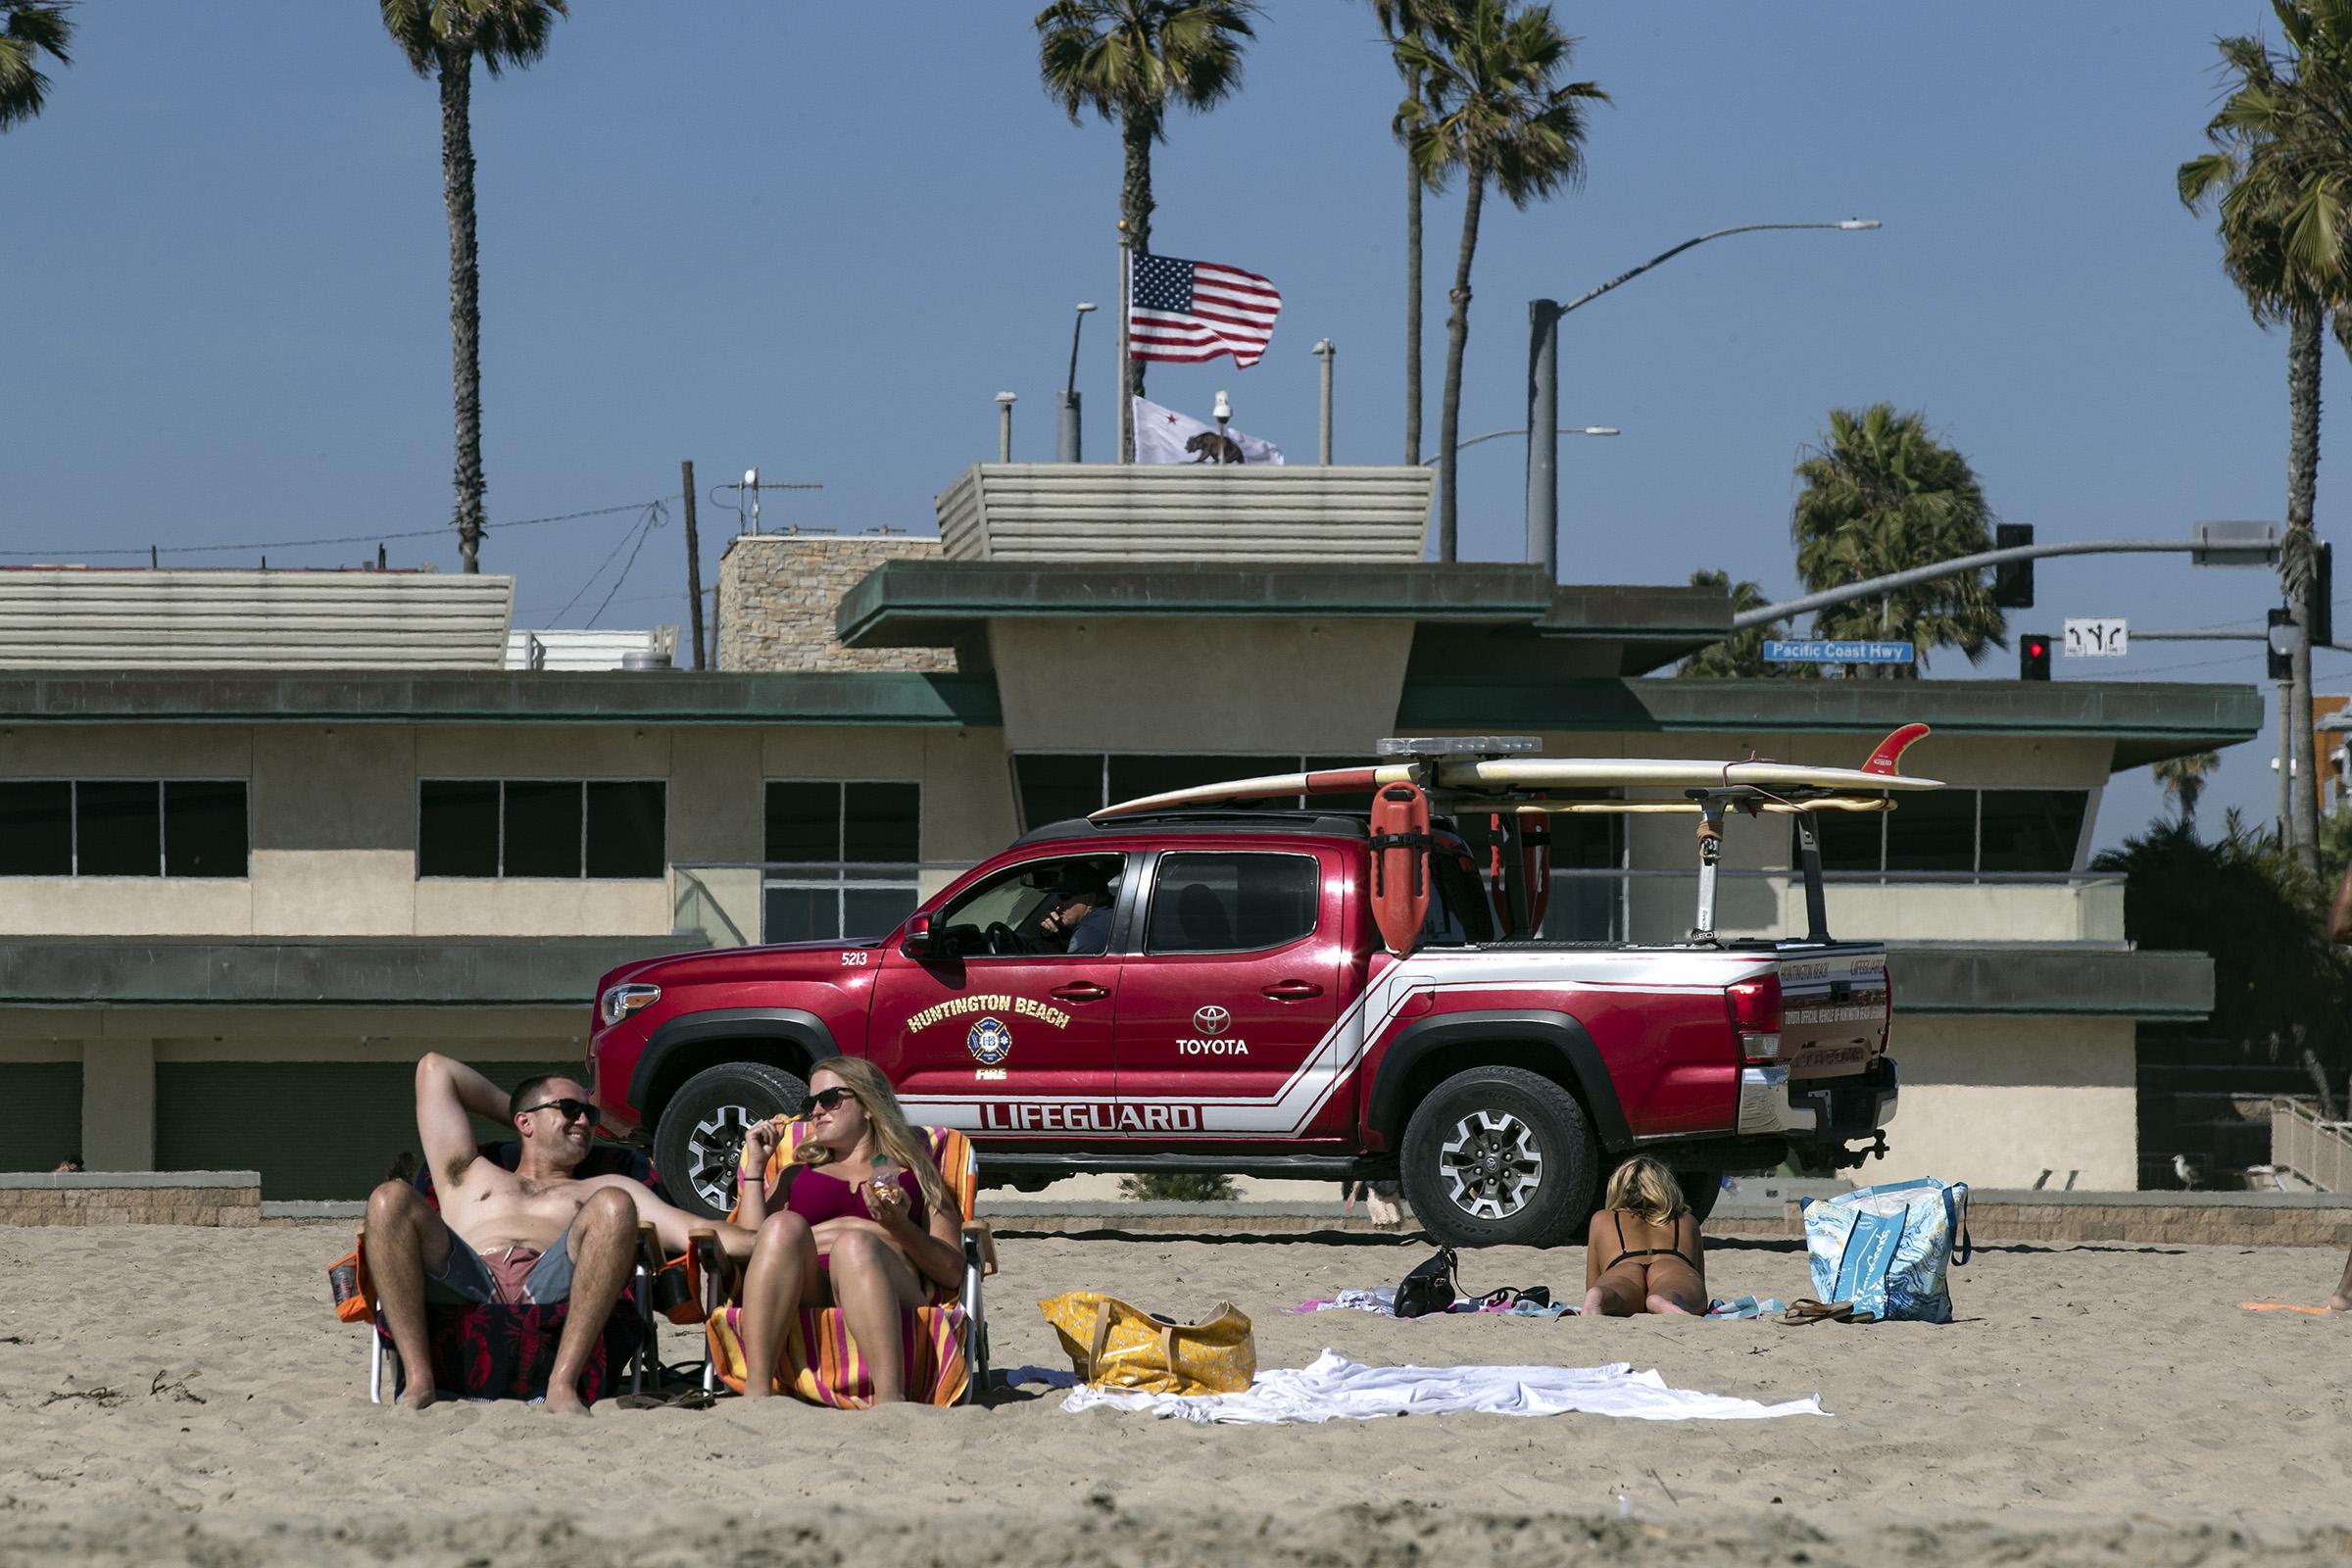 A lifeguard truck patrols the beach as a heatwave hits Southern California amid the coronavirus pandemic, in Huntington Beach, California, on April 24, 2020.